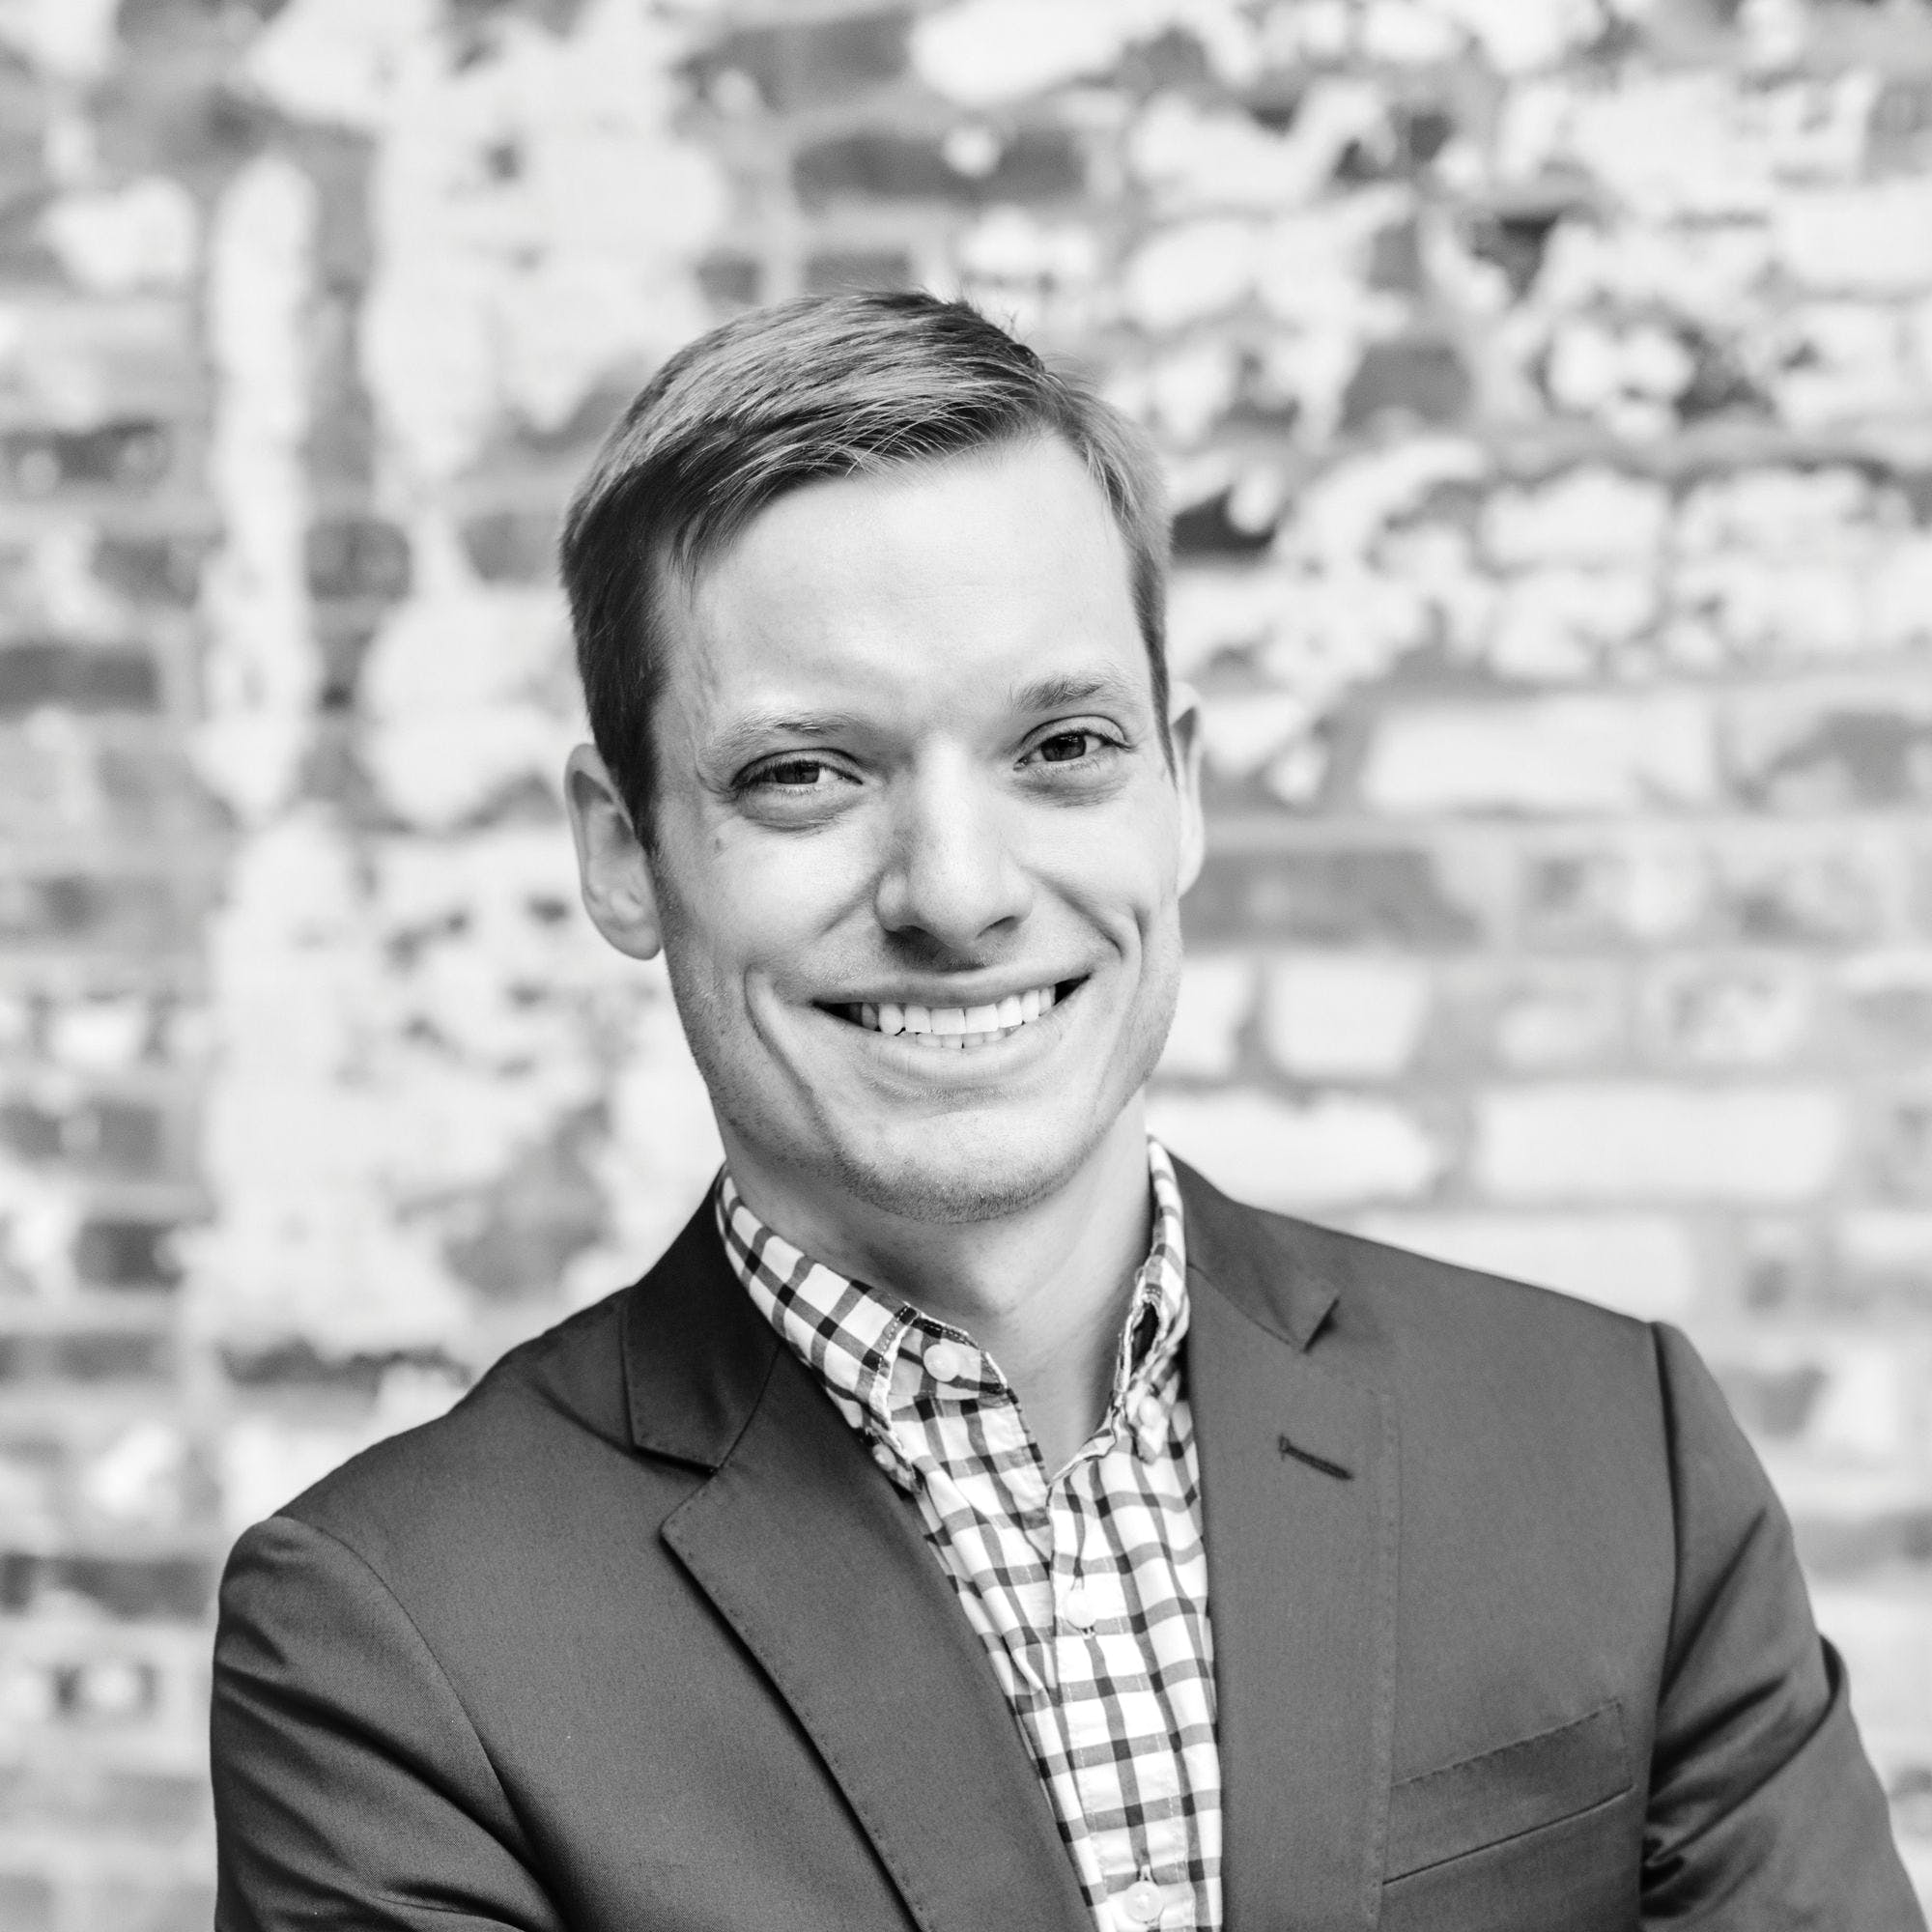 Meet Our Southeastern U.S. Labs Team: Ross Kimbrel